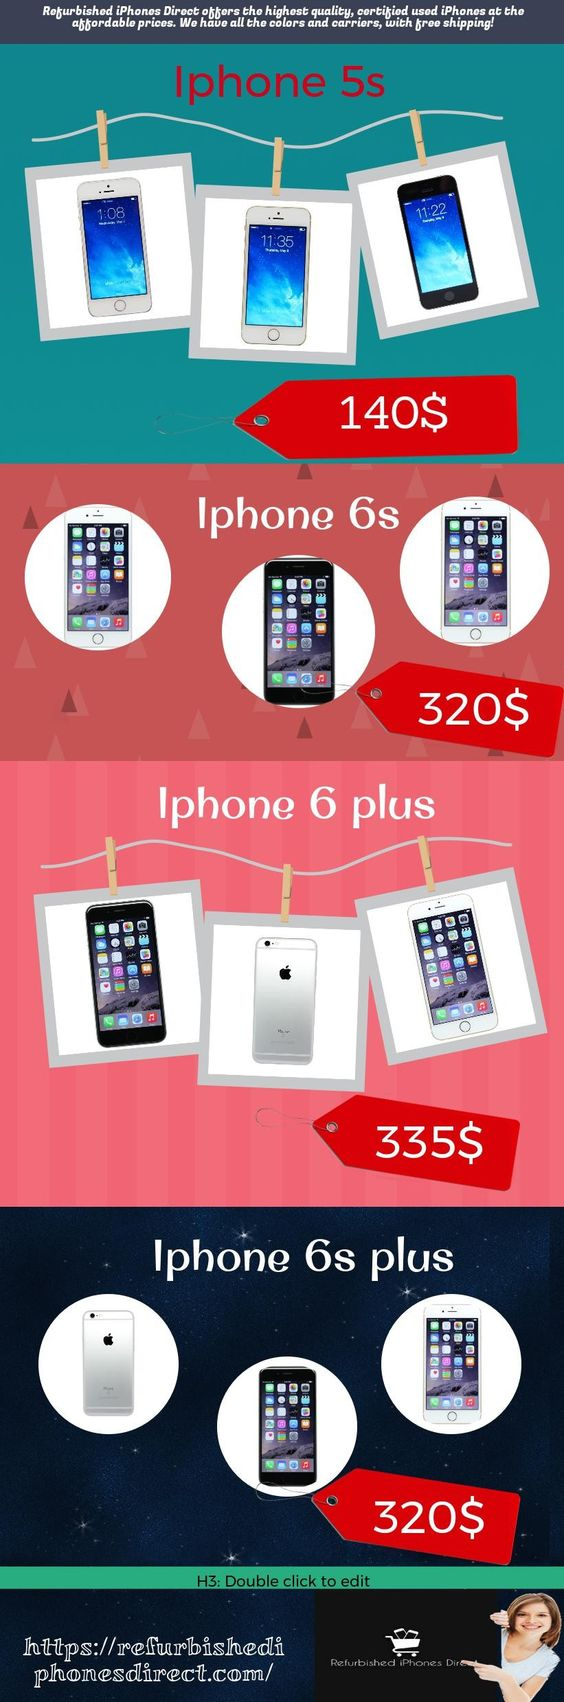 Www etradesupply com media uploaded iphone 5c vs iphone 5 screen jpg - Best 25 Refurbished Iphones Ideas On Pinterest Iphone 6 Gold 16gb Iphone 5 16gb And Iphone 5 64gb